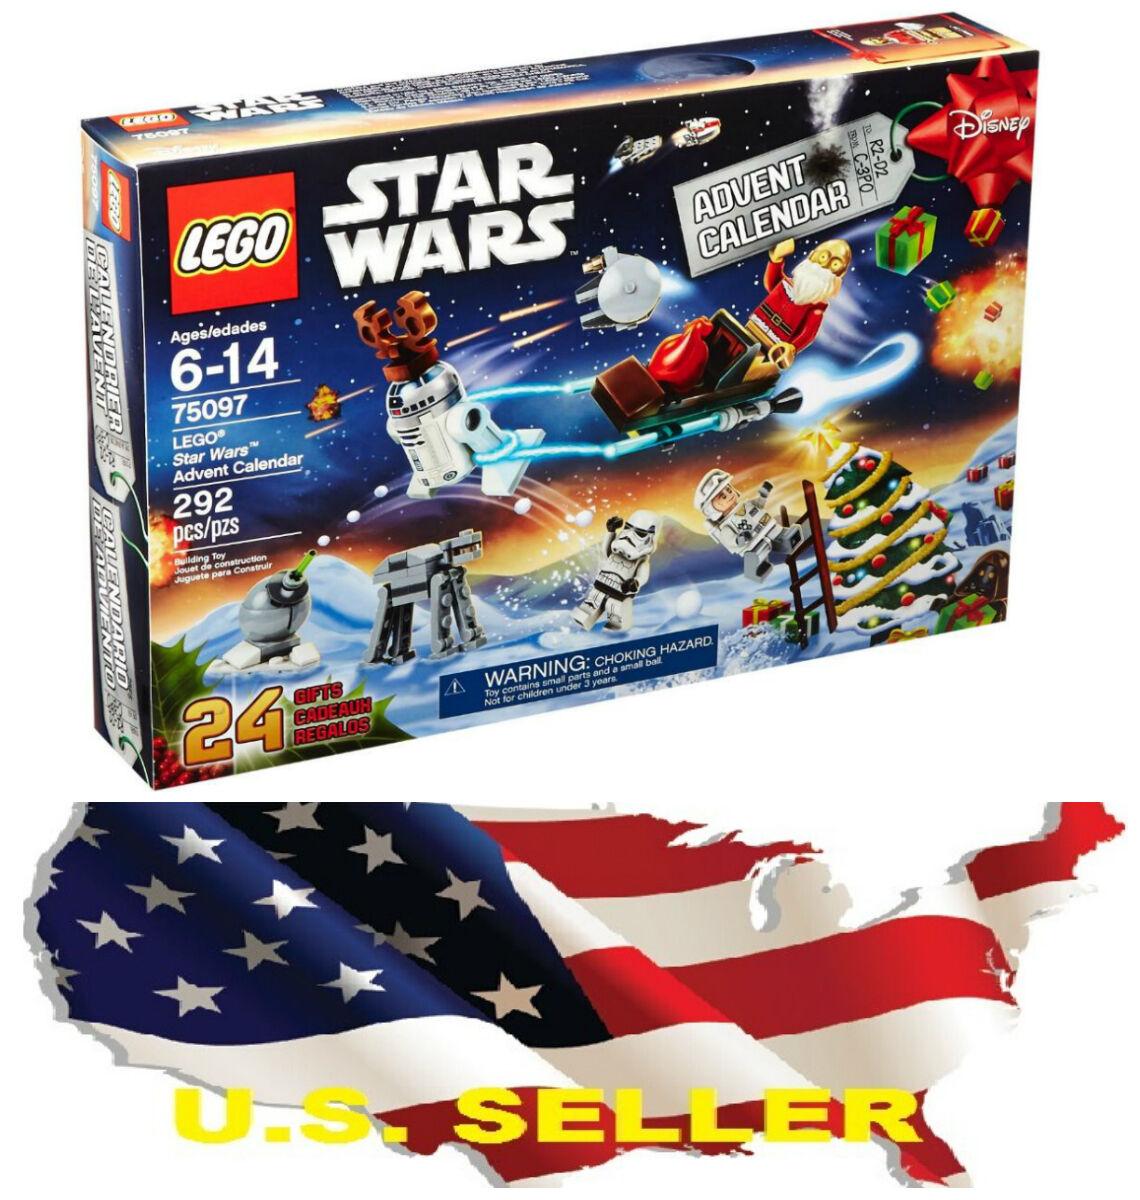 NEW LEGO 75097 Star Wars Advent Calendar Building Kit 292 PCs READY TO SHIP